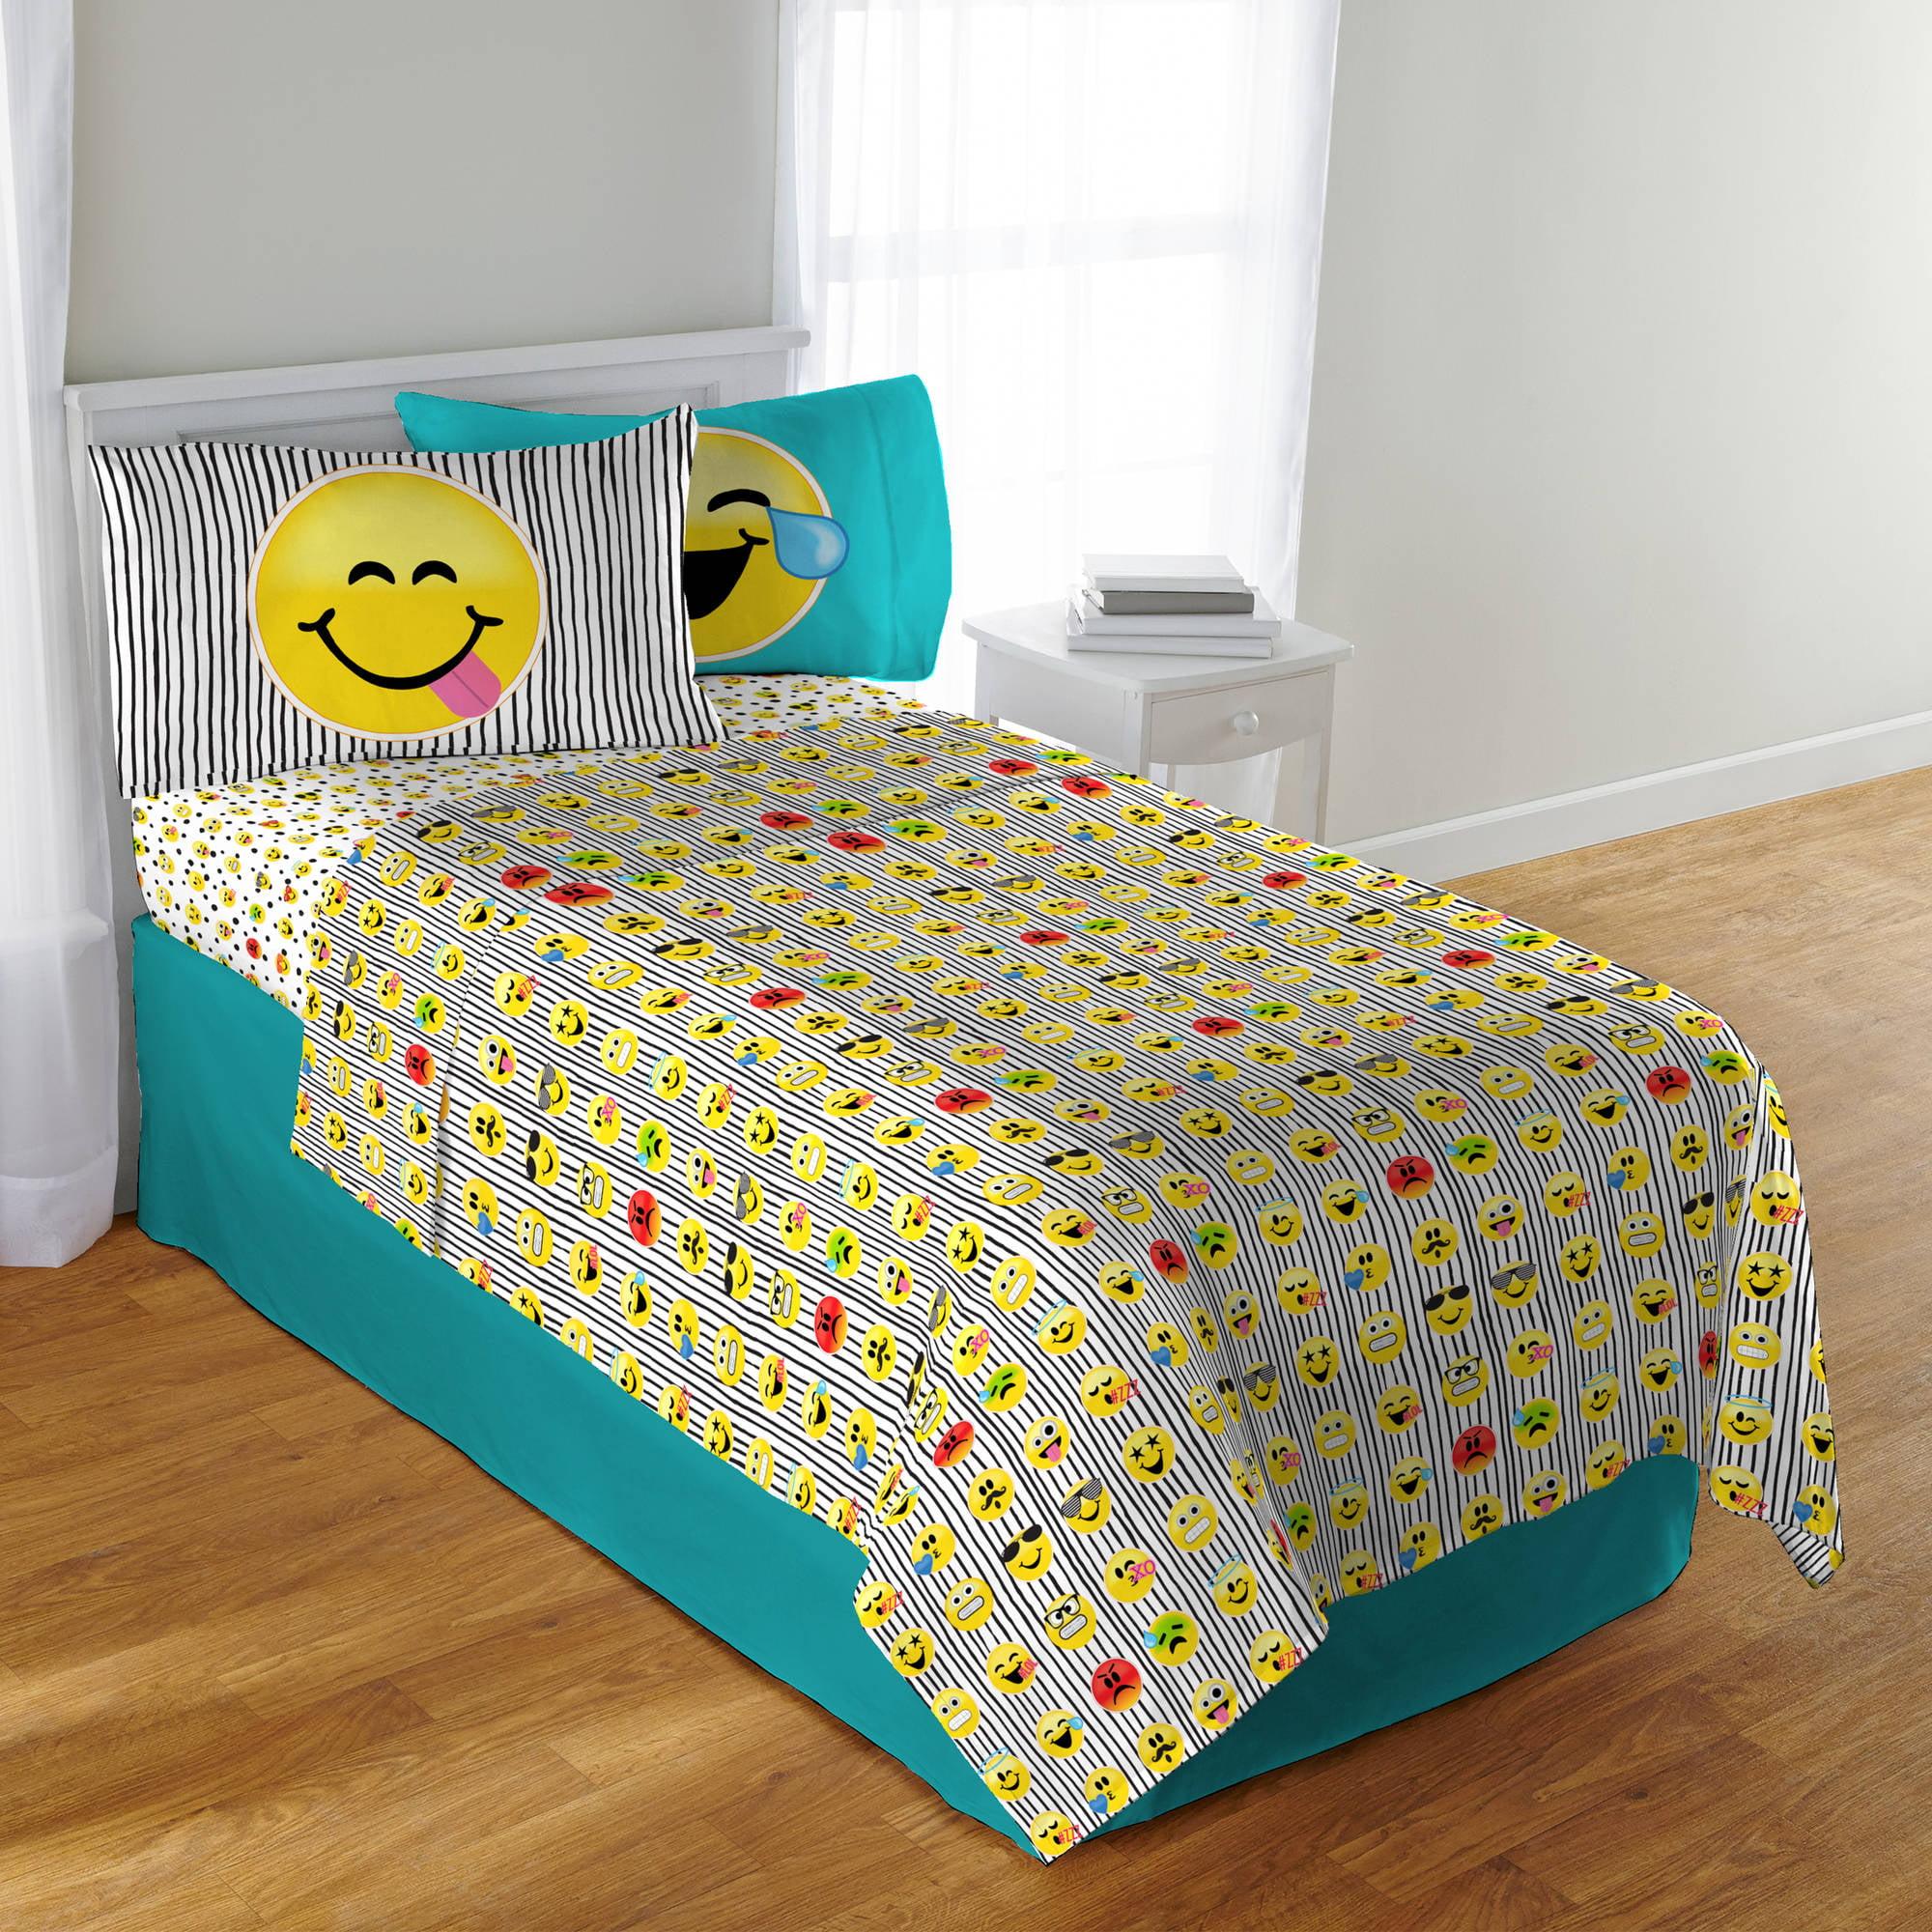 Emoji Nation Forever Hy Bed In A Bag Bedding Set Exclusive